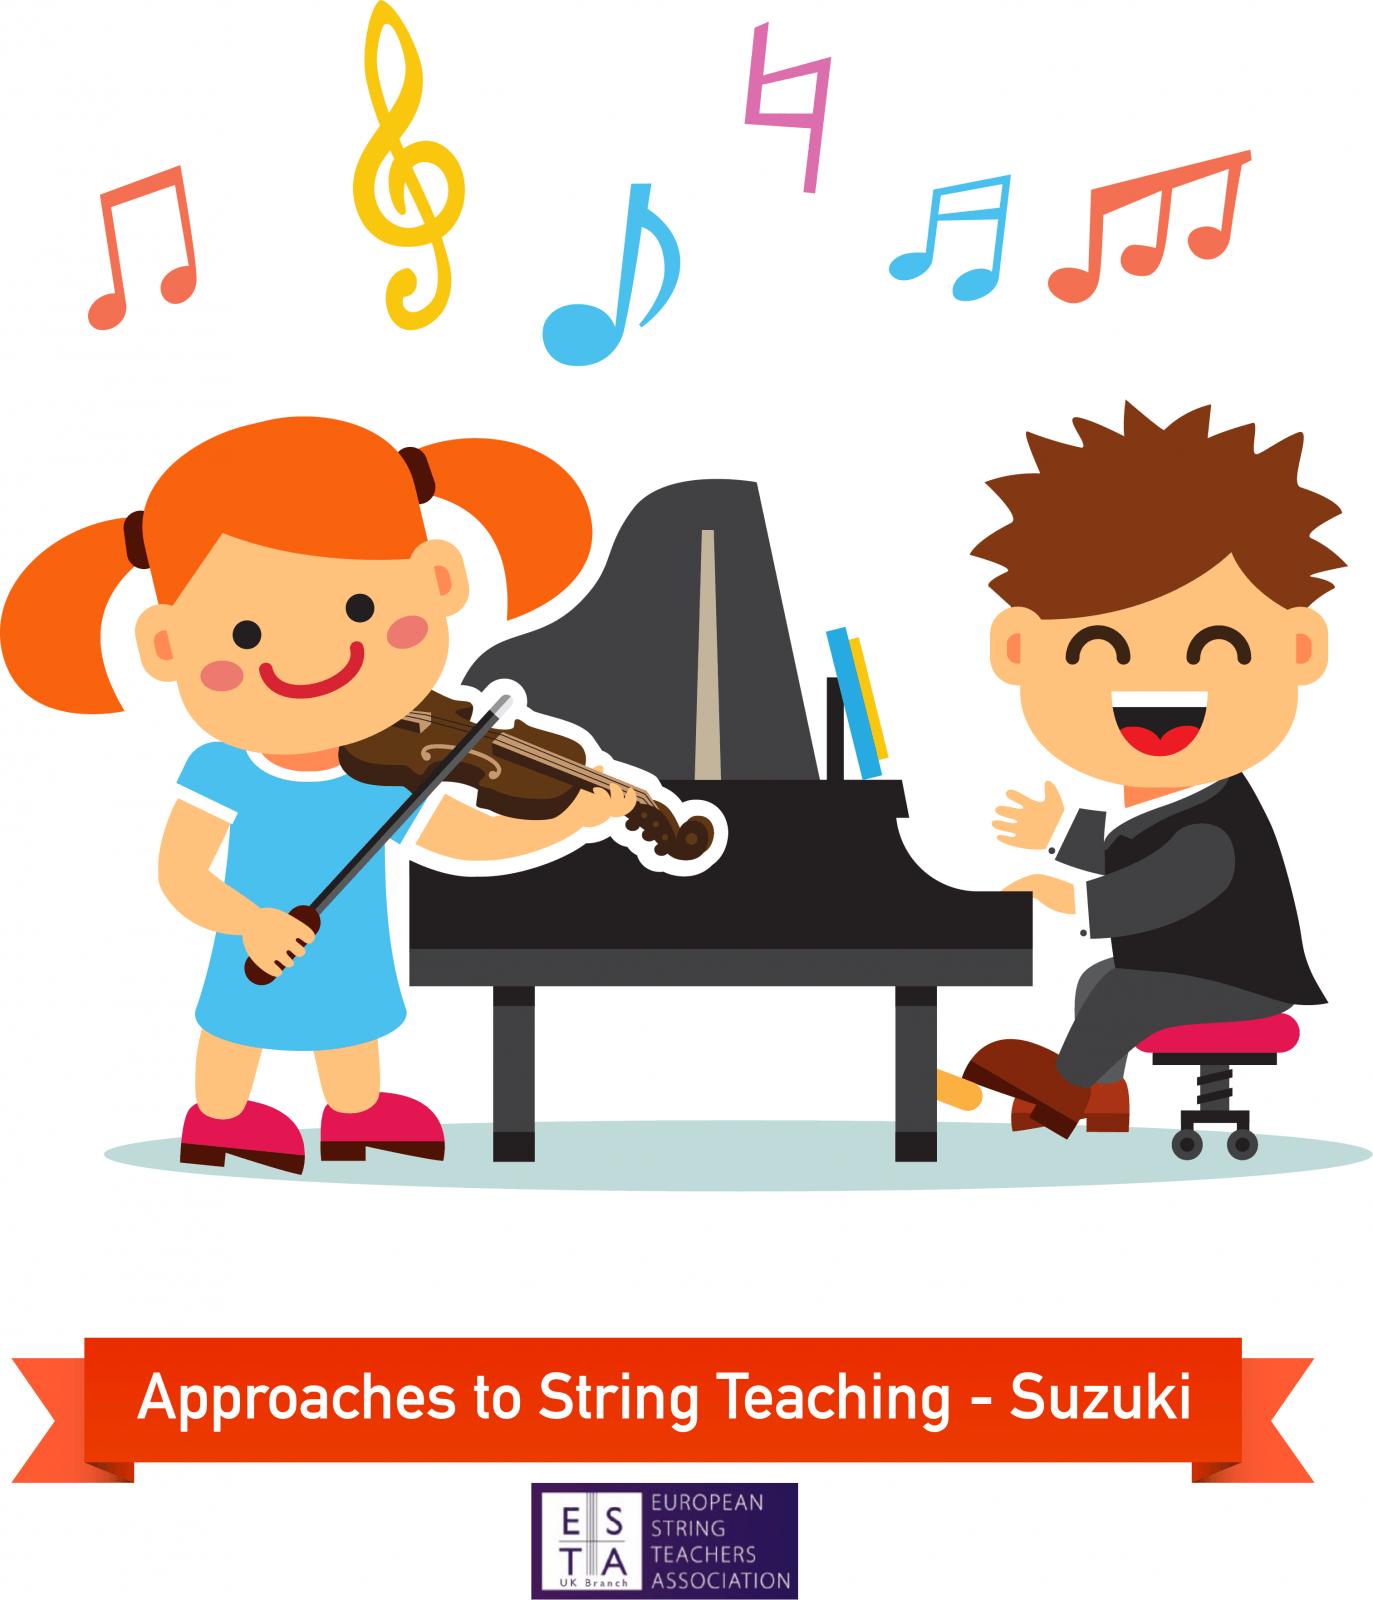 Approaches to String Teaching - Suzuki